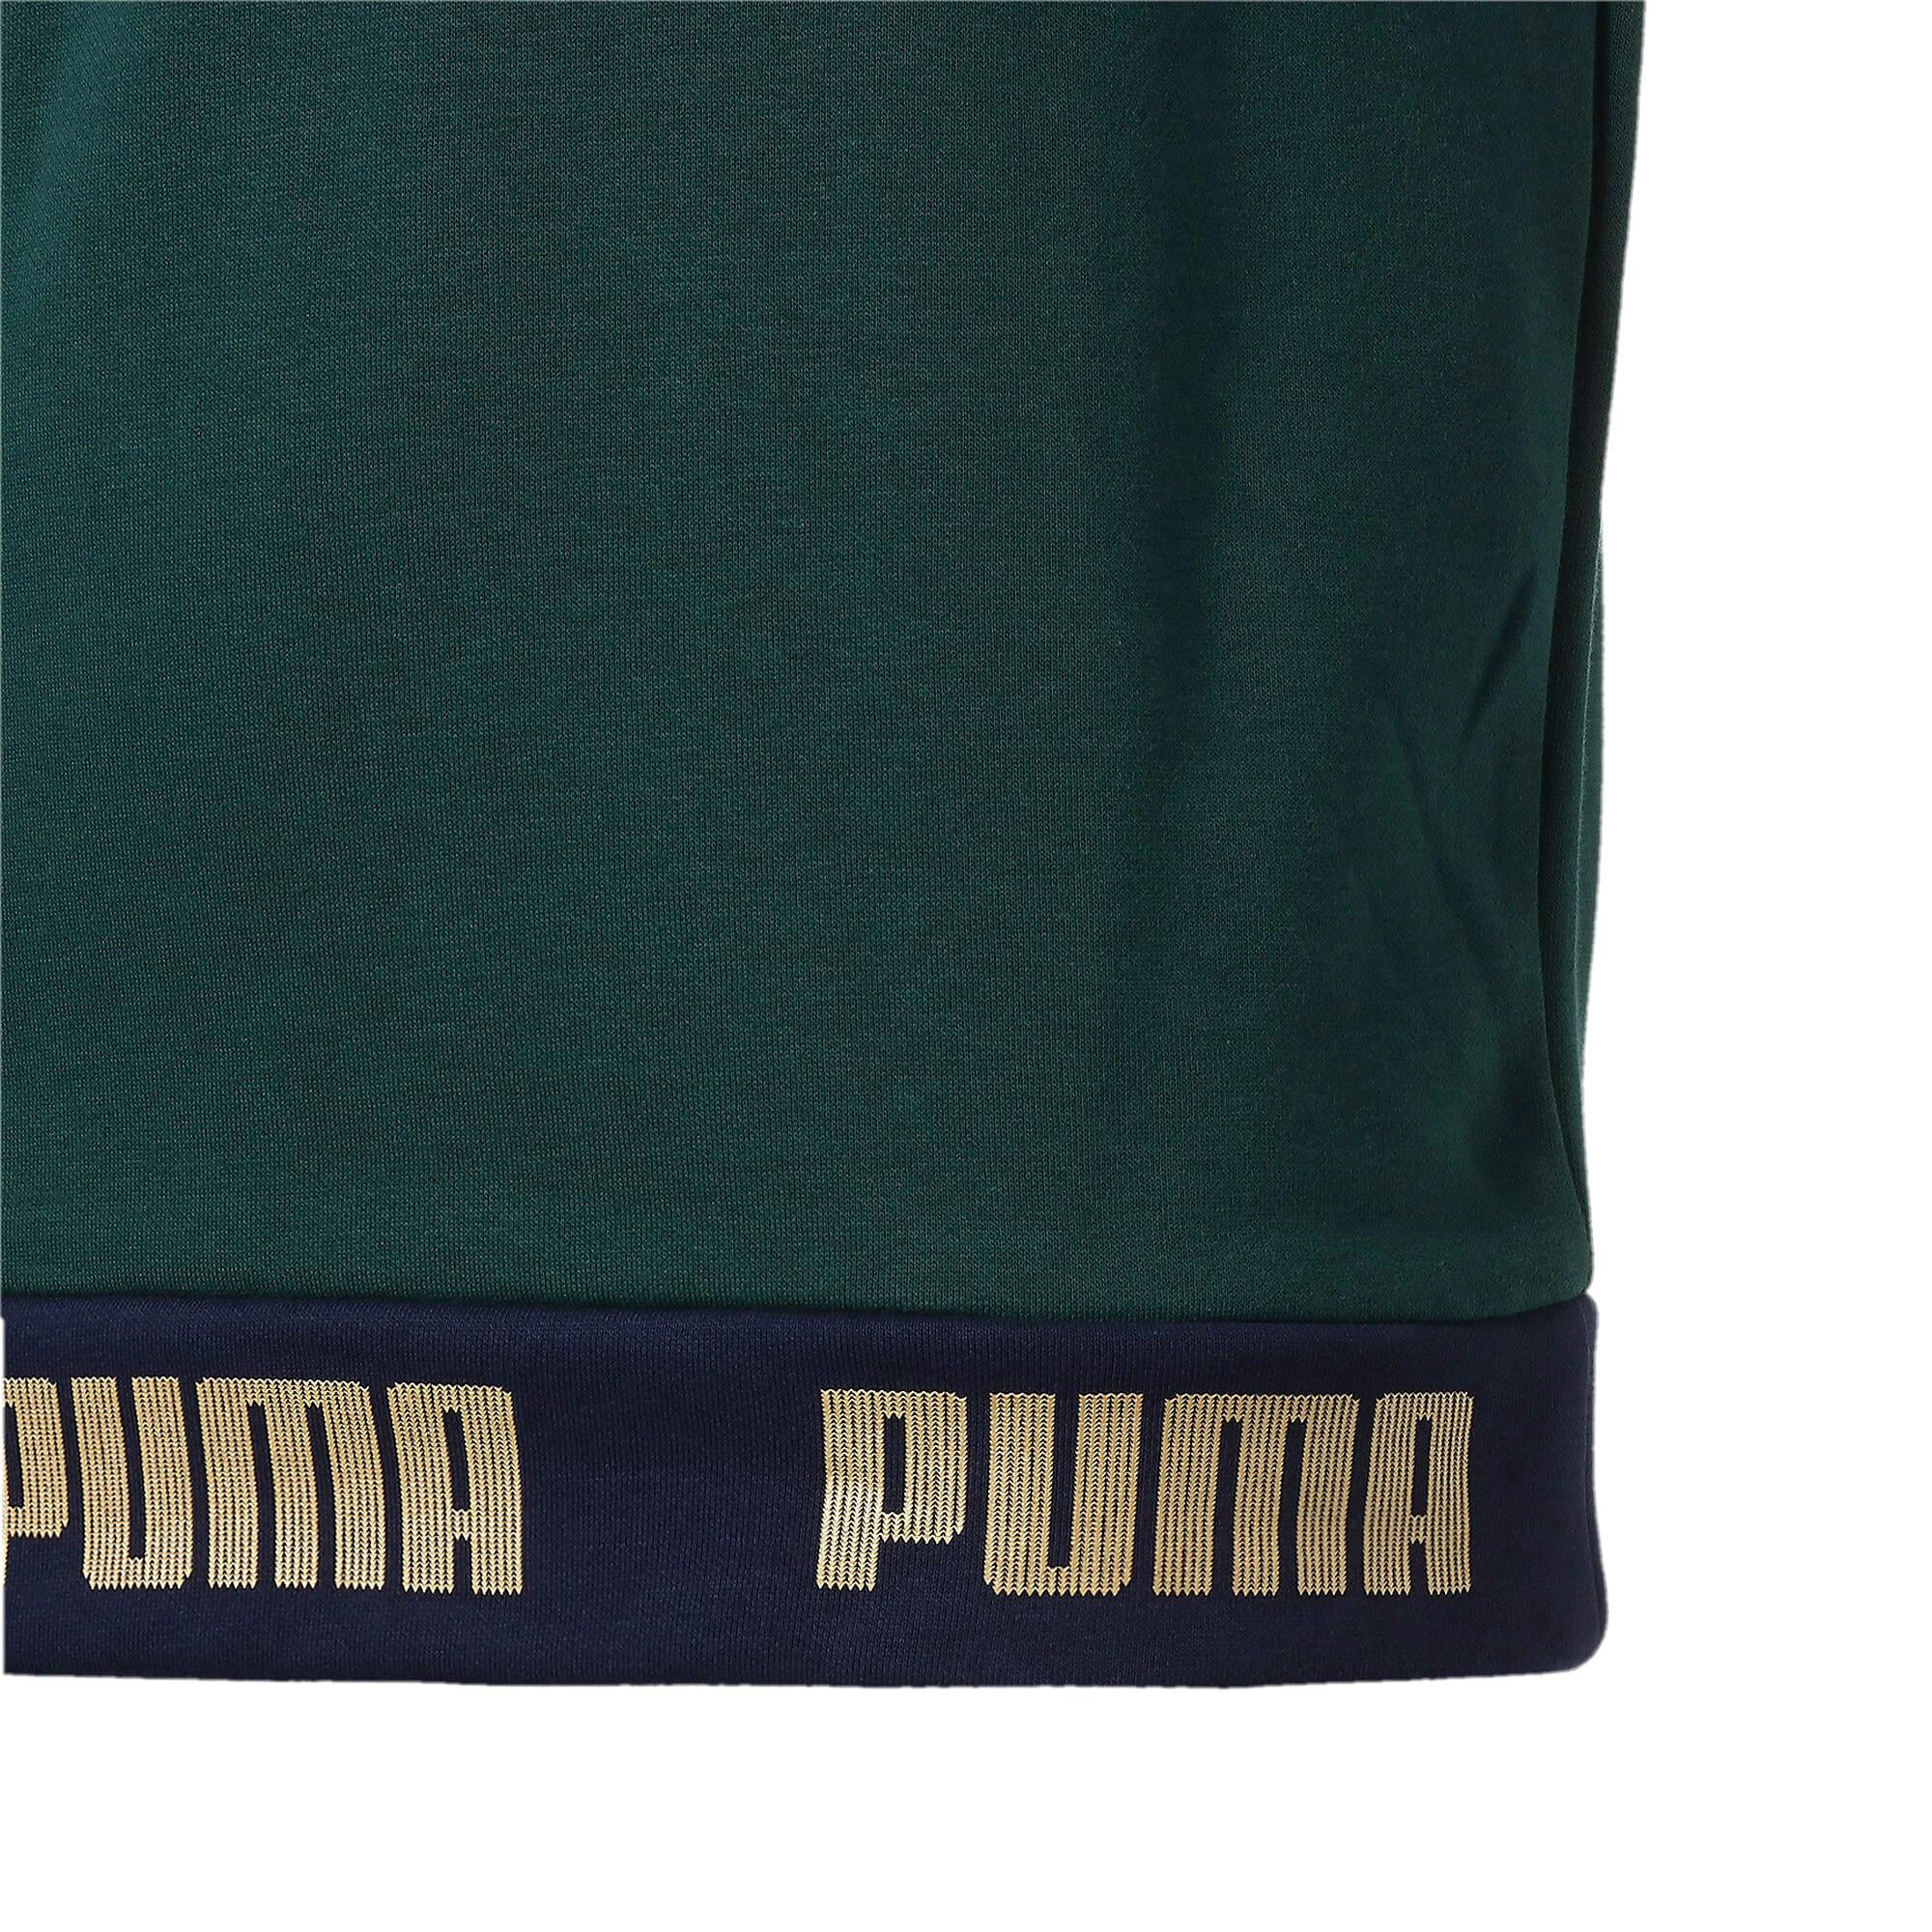 Thumbnail 6 of FIGC イタリア FTBL CULTURE クルースウェット, Ponderosa Pine-Team Gold, medium-JPN